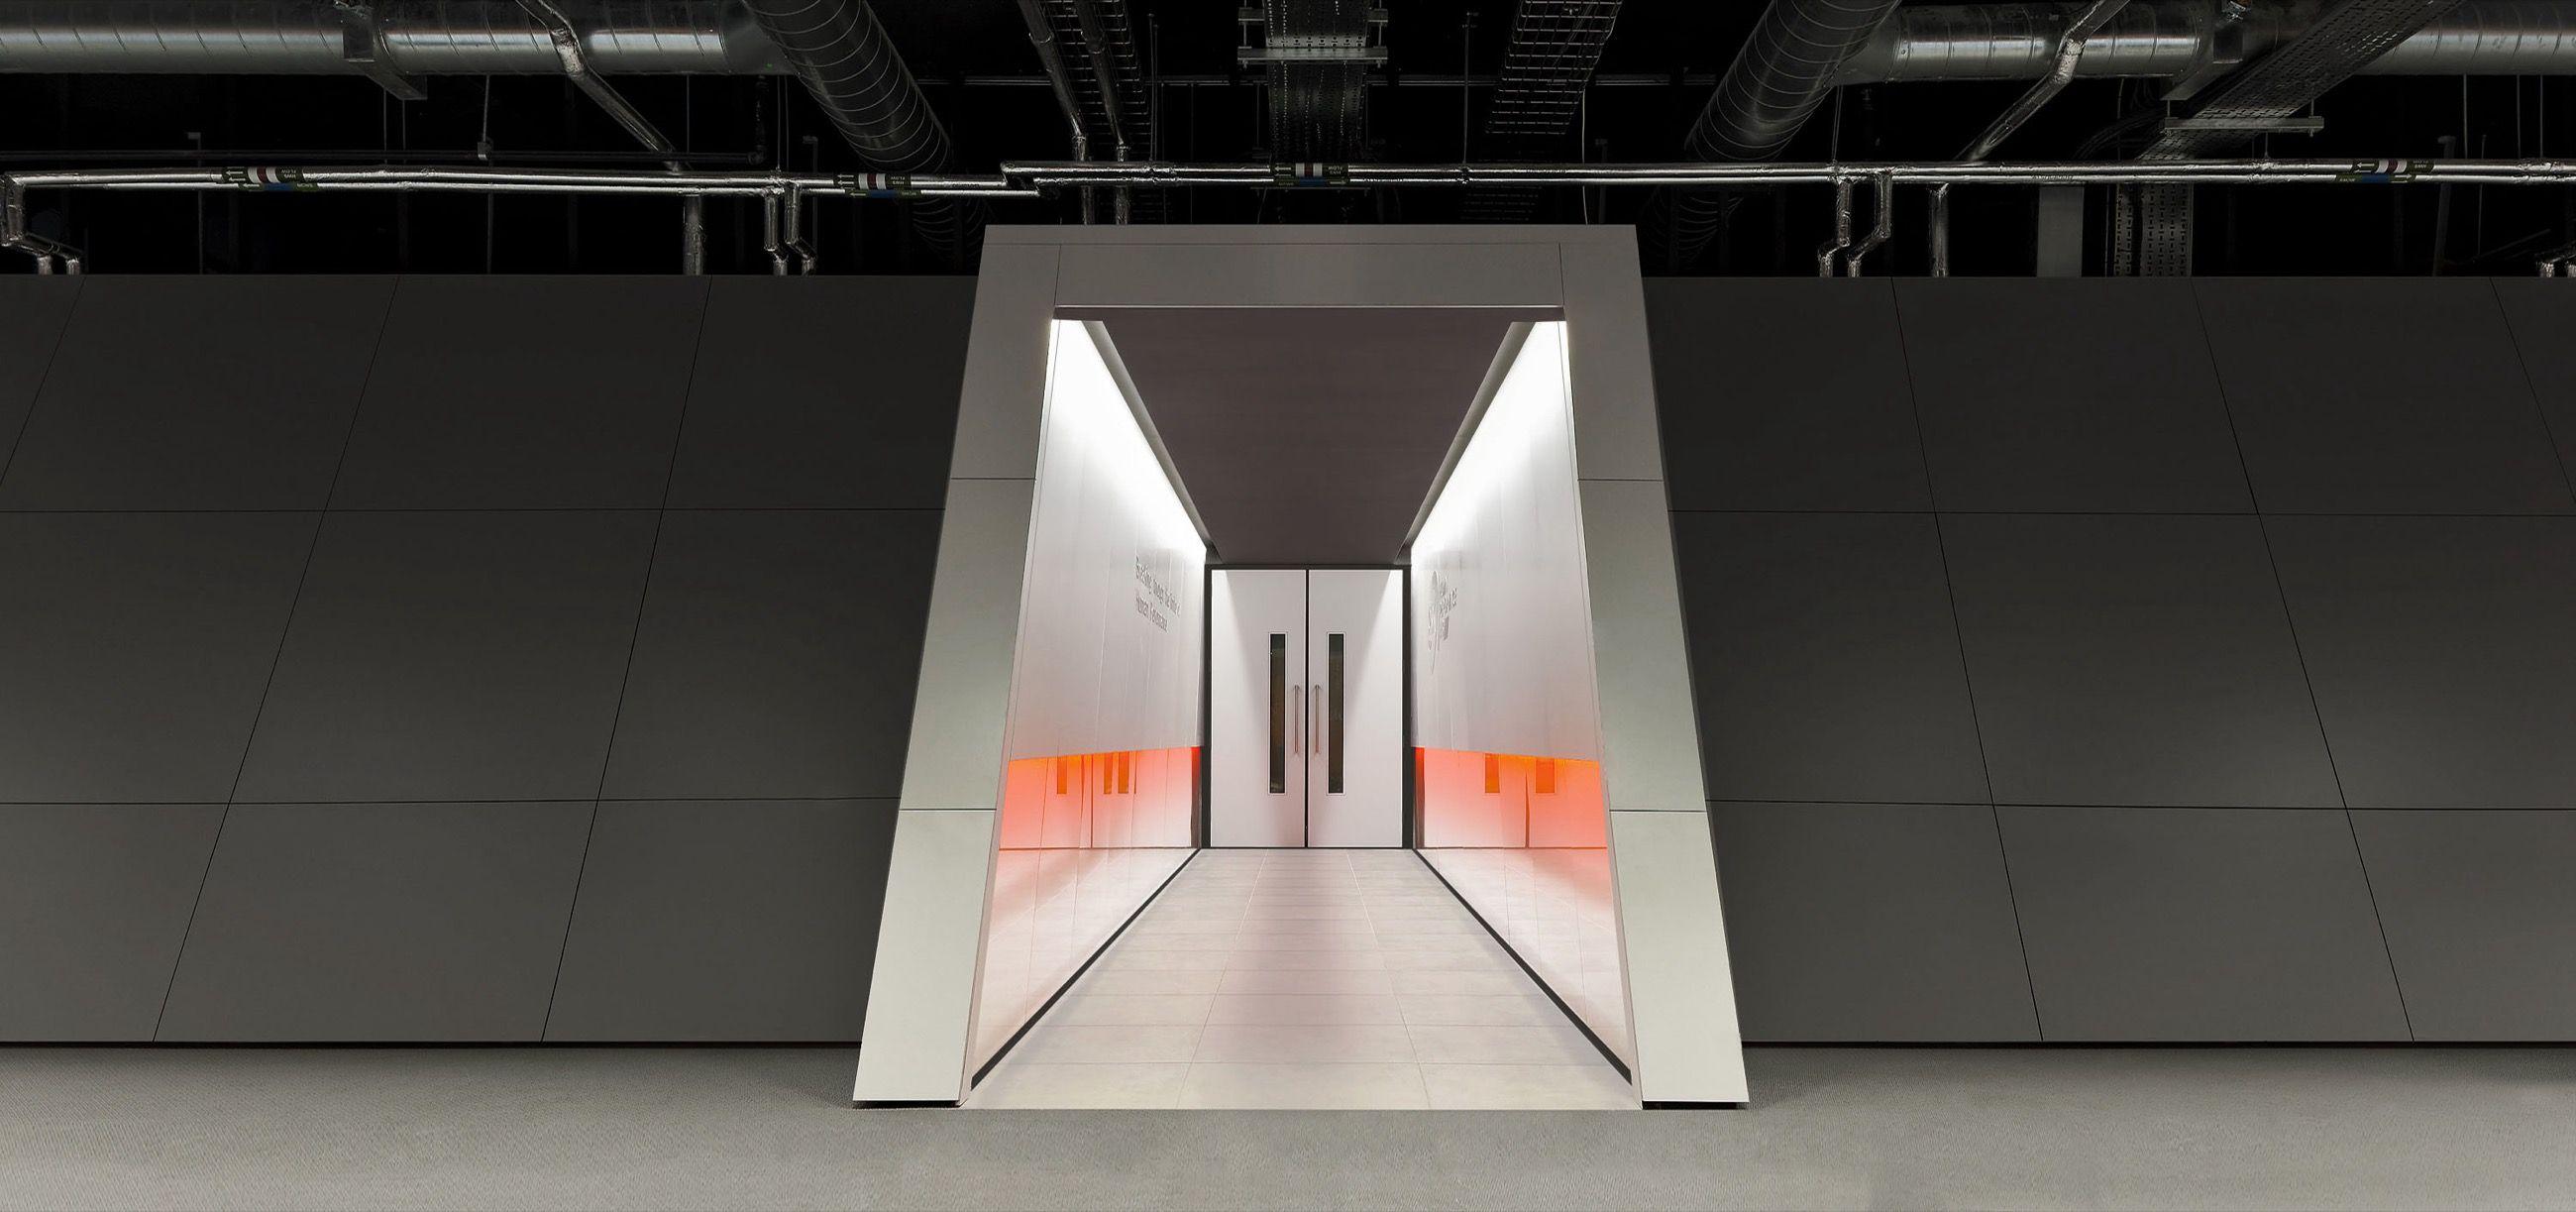 A corridor inside the GSK lab